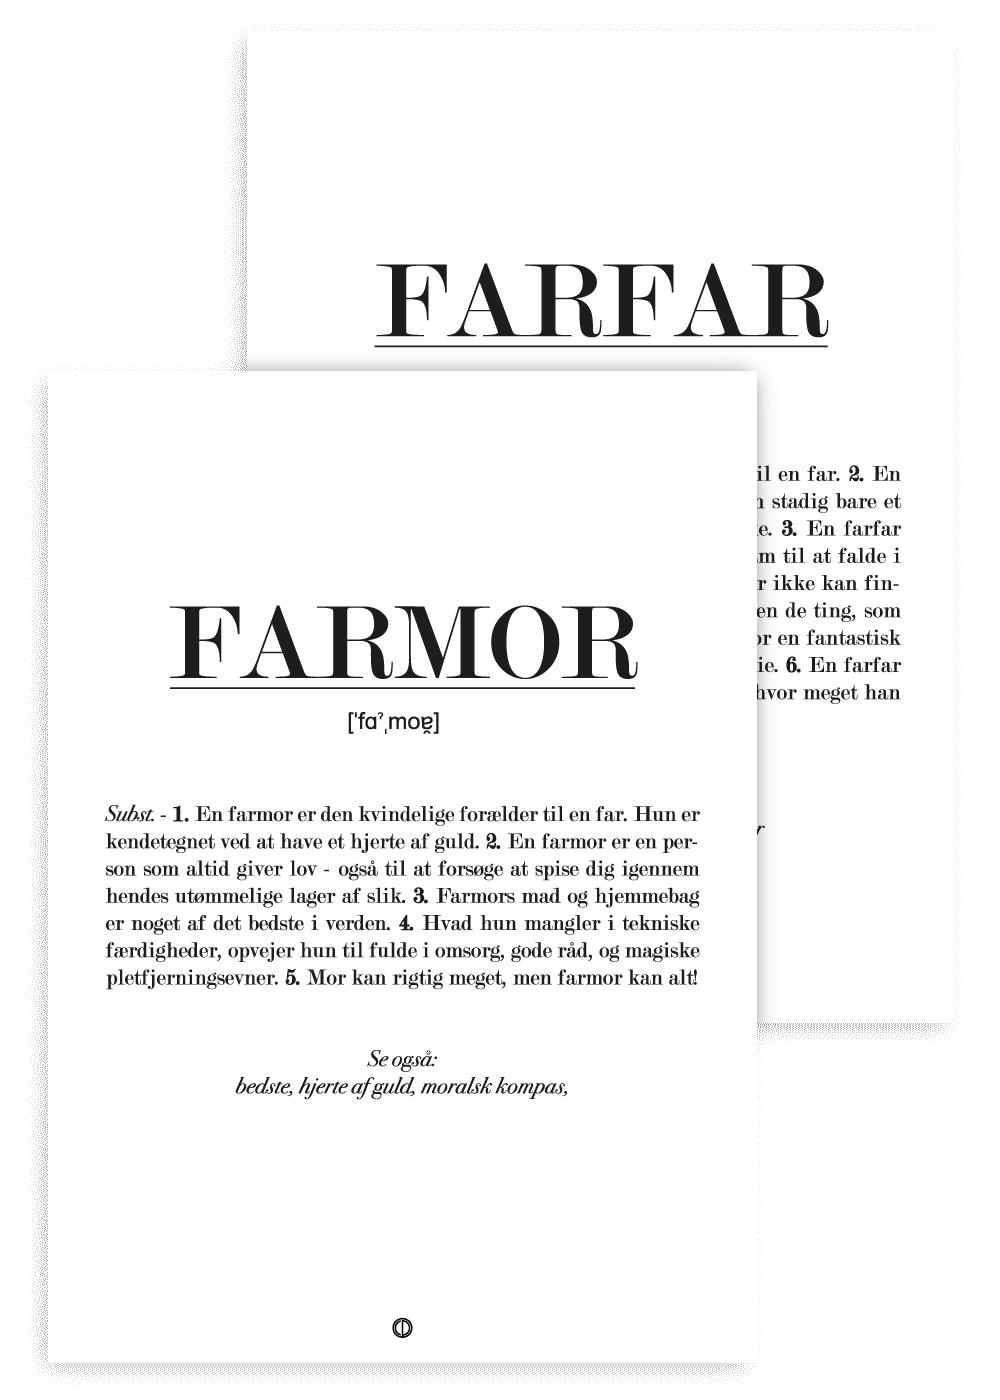 Farmor og farfar - Defintion (Pakketilbud)